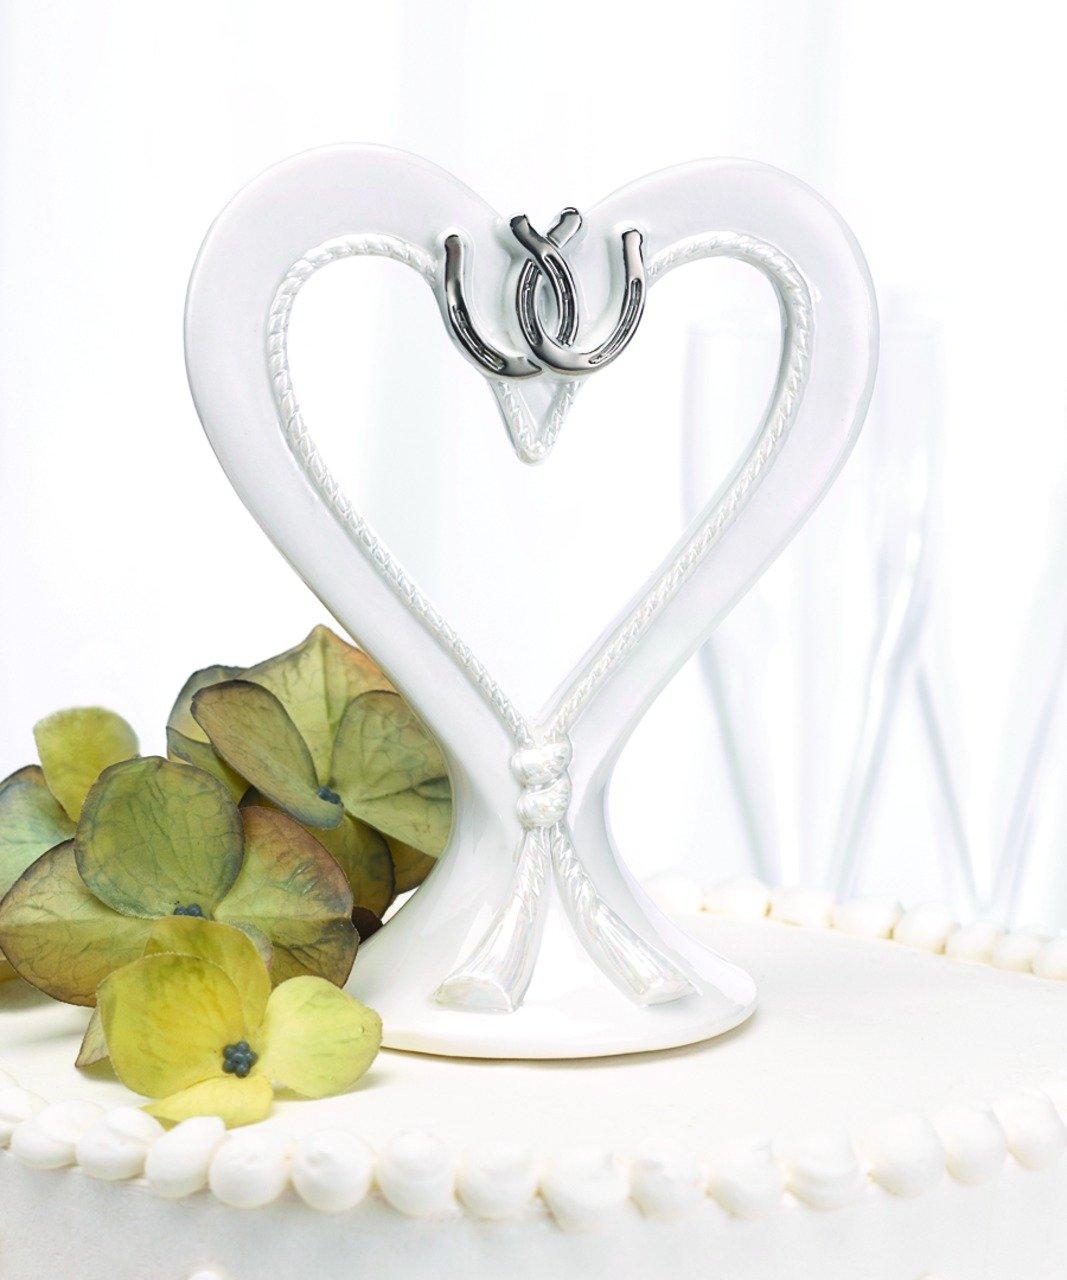 Hortense B. Hewitt Wedding Accessories Linked Horseshoes Cake Top, 5-1/4-Inch Tall by Hortense B. Hewitt (Image #2)